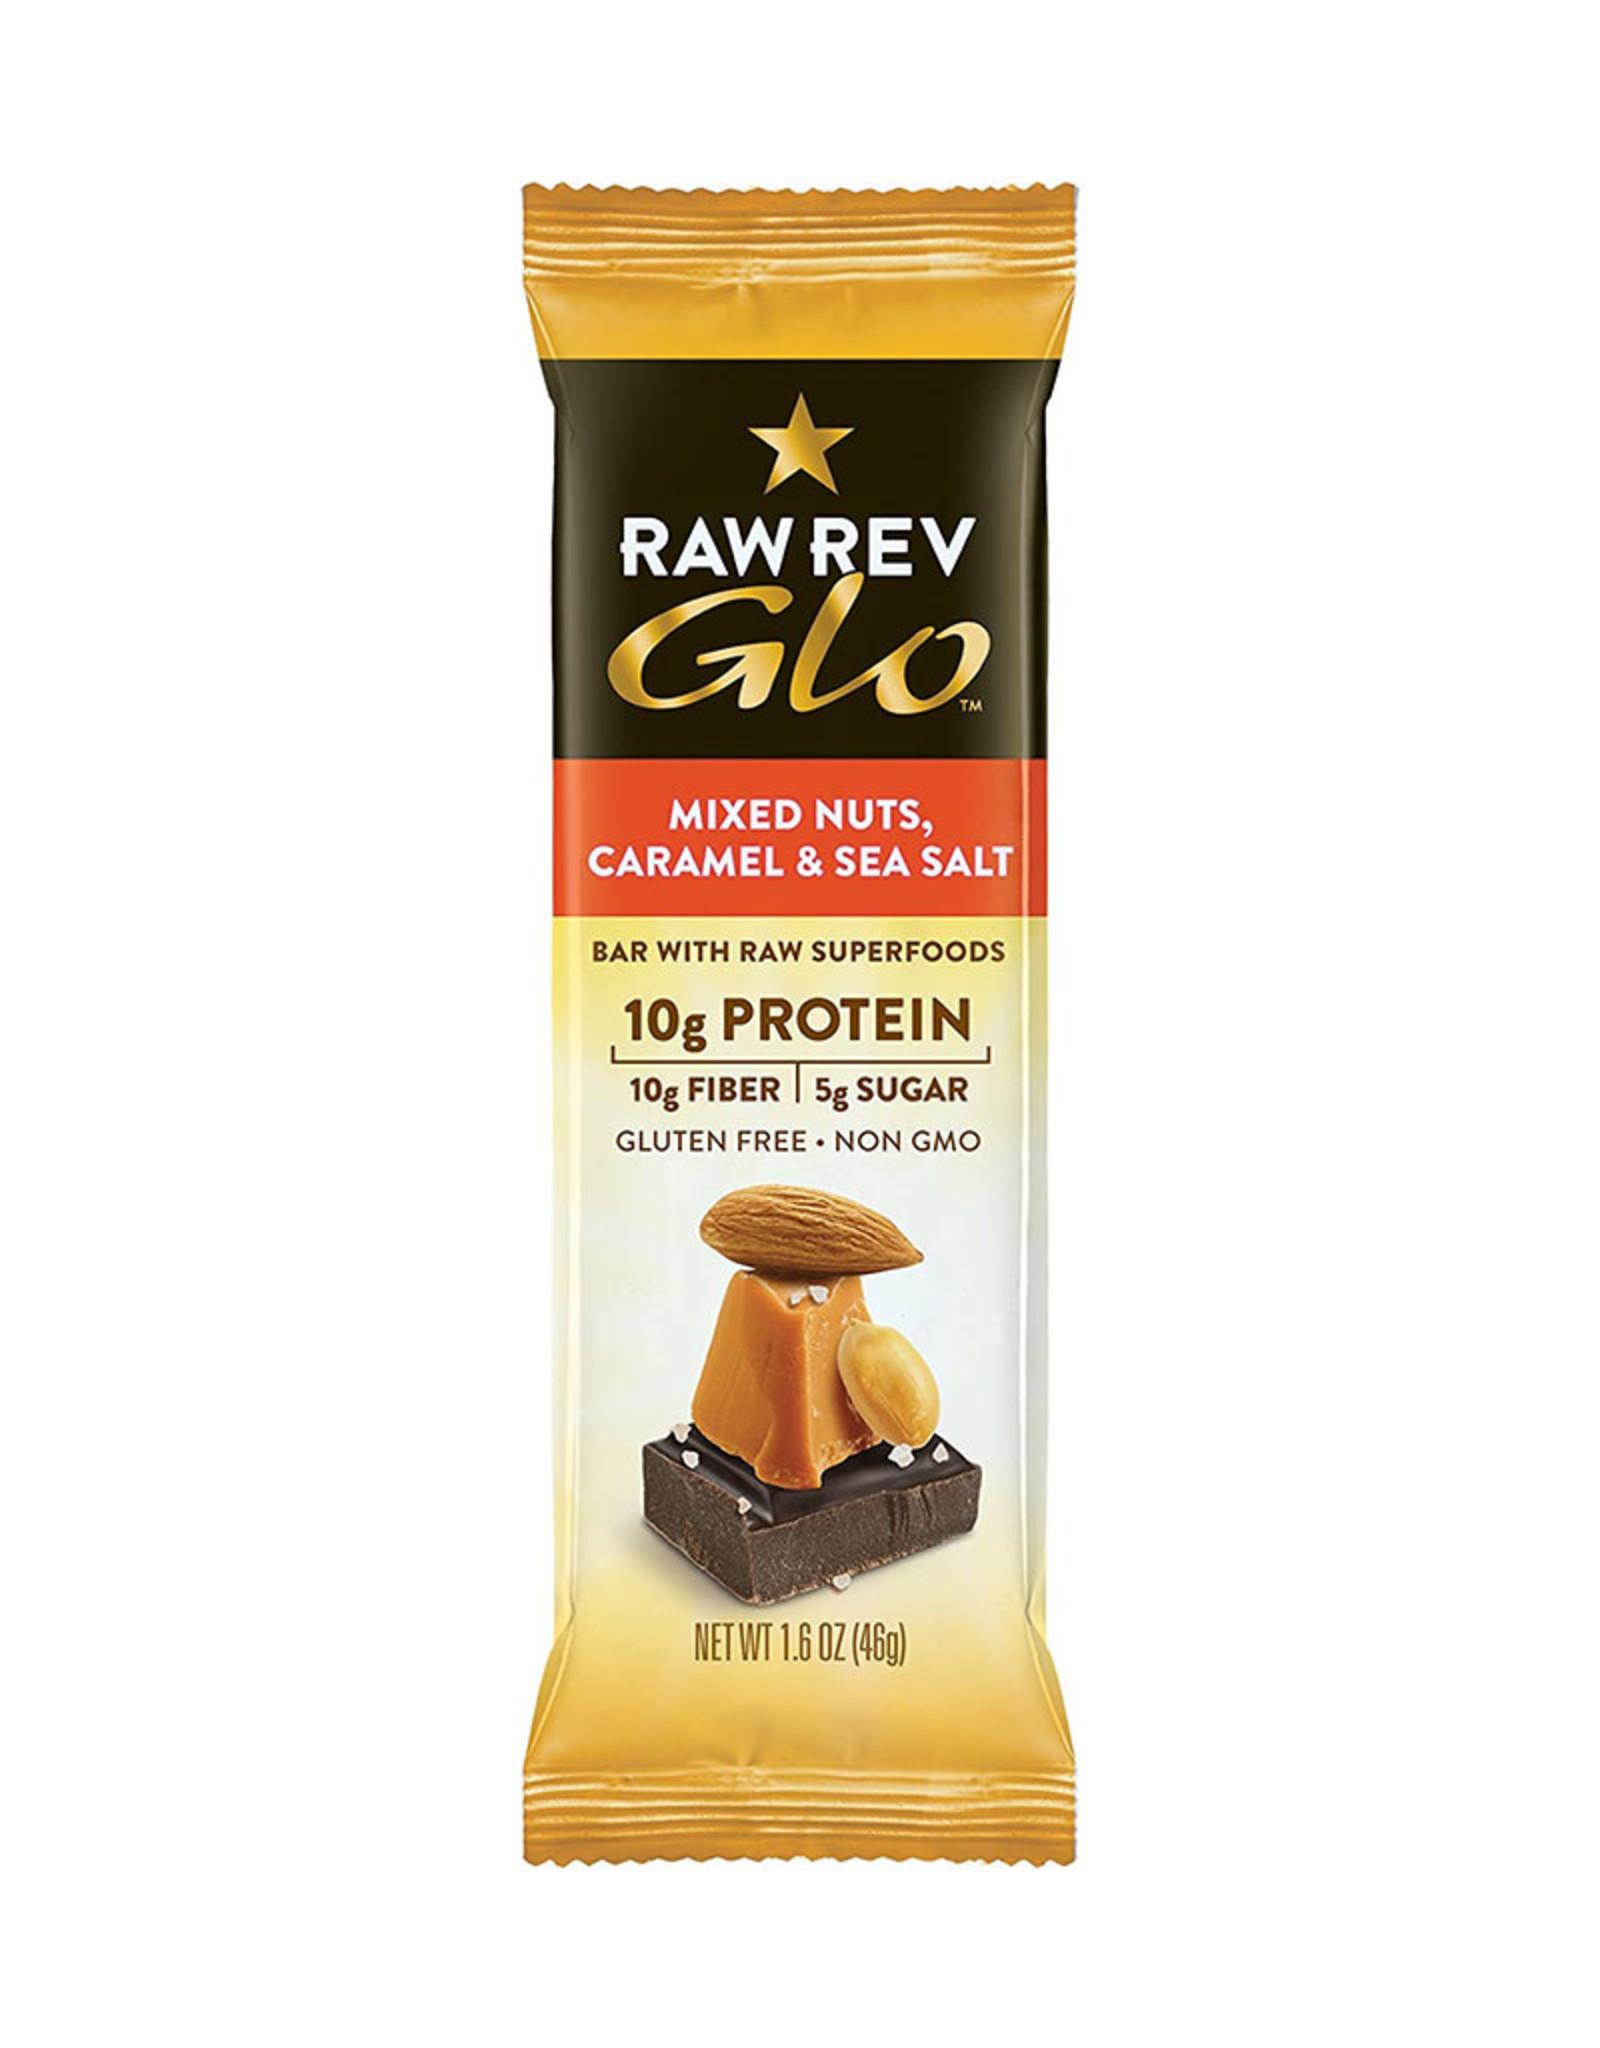 Raw Rev Raw Rev Bar, Mixed Nuts, Caramel & Sea Salt (46g)